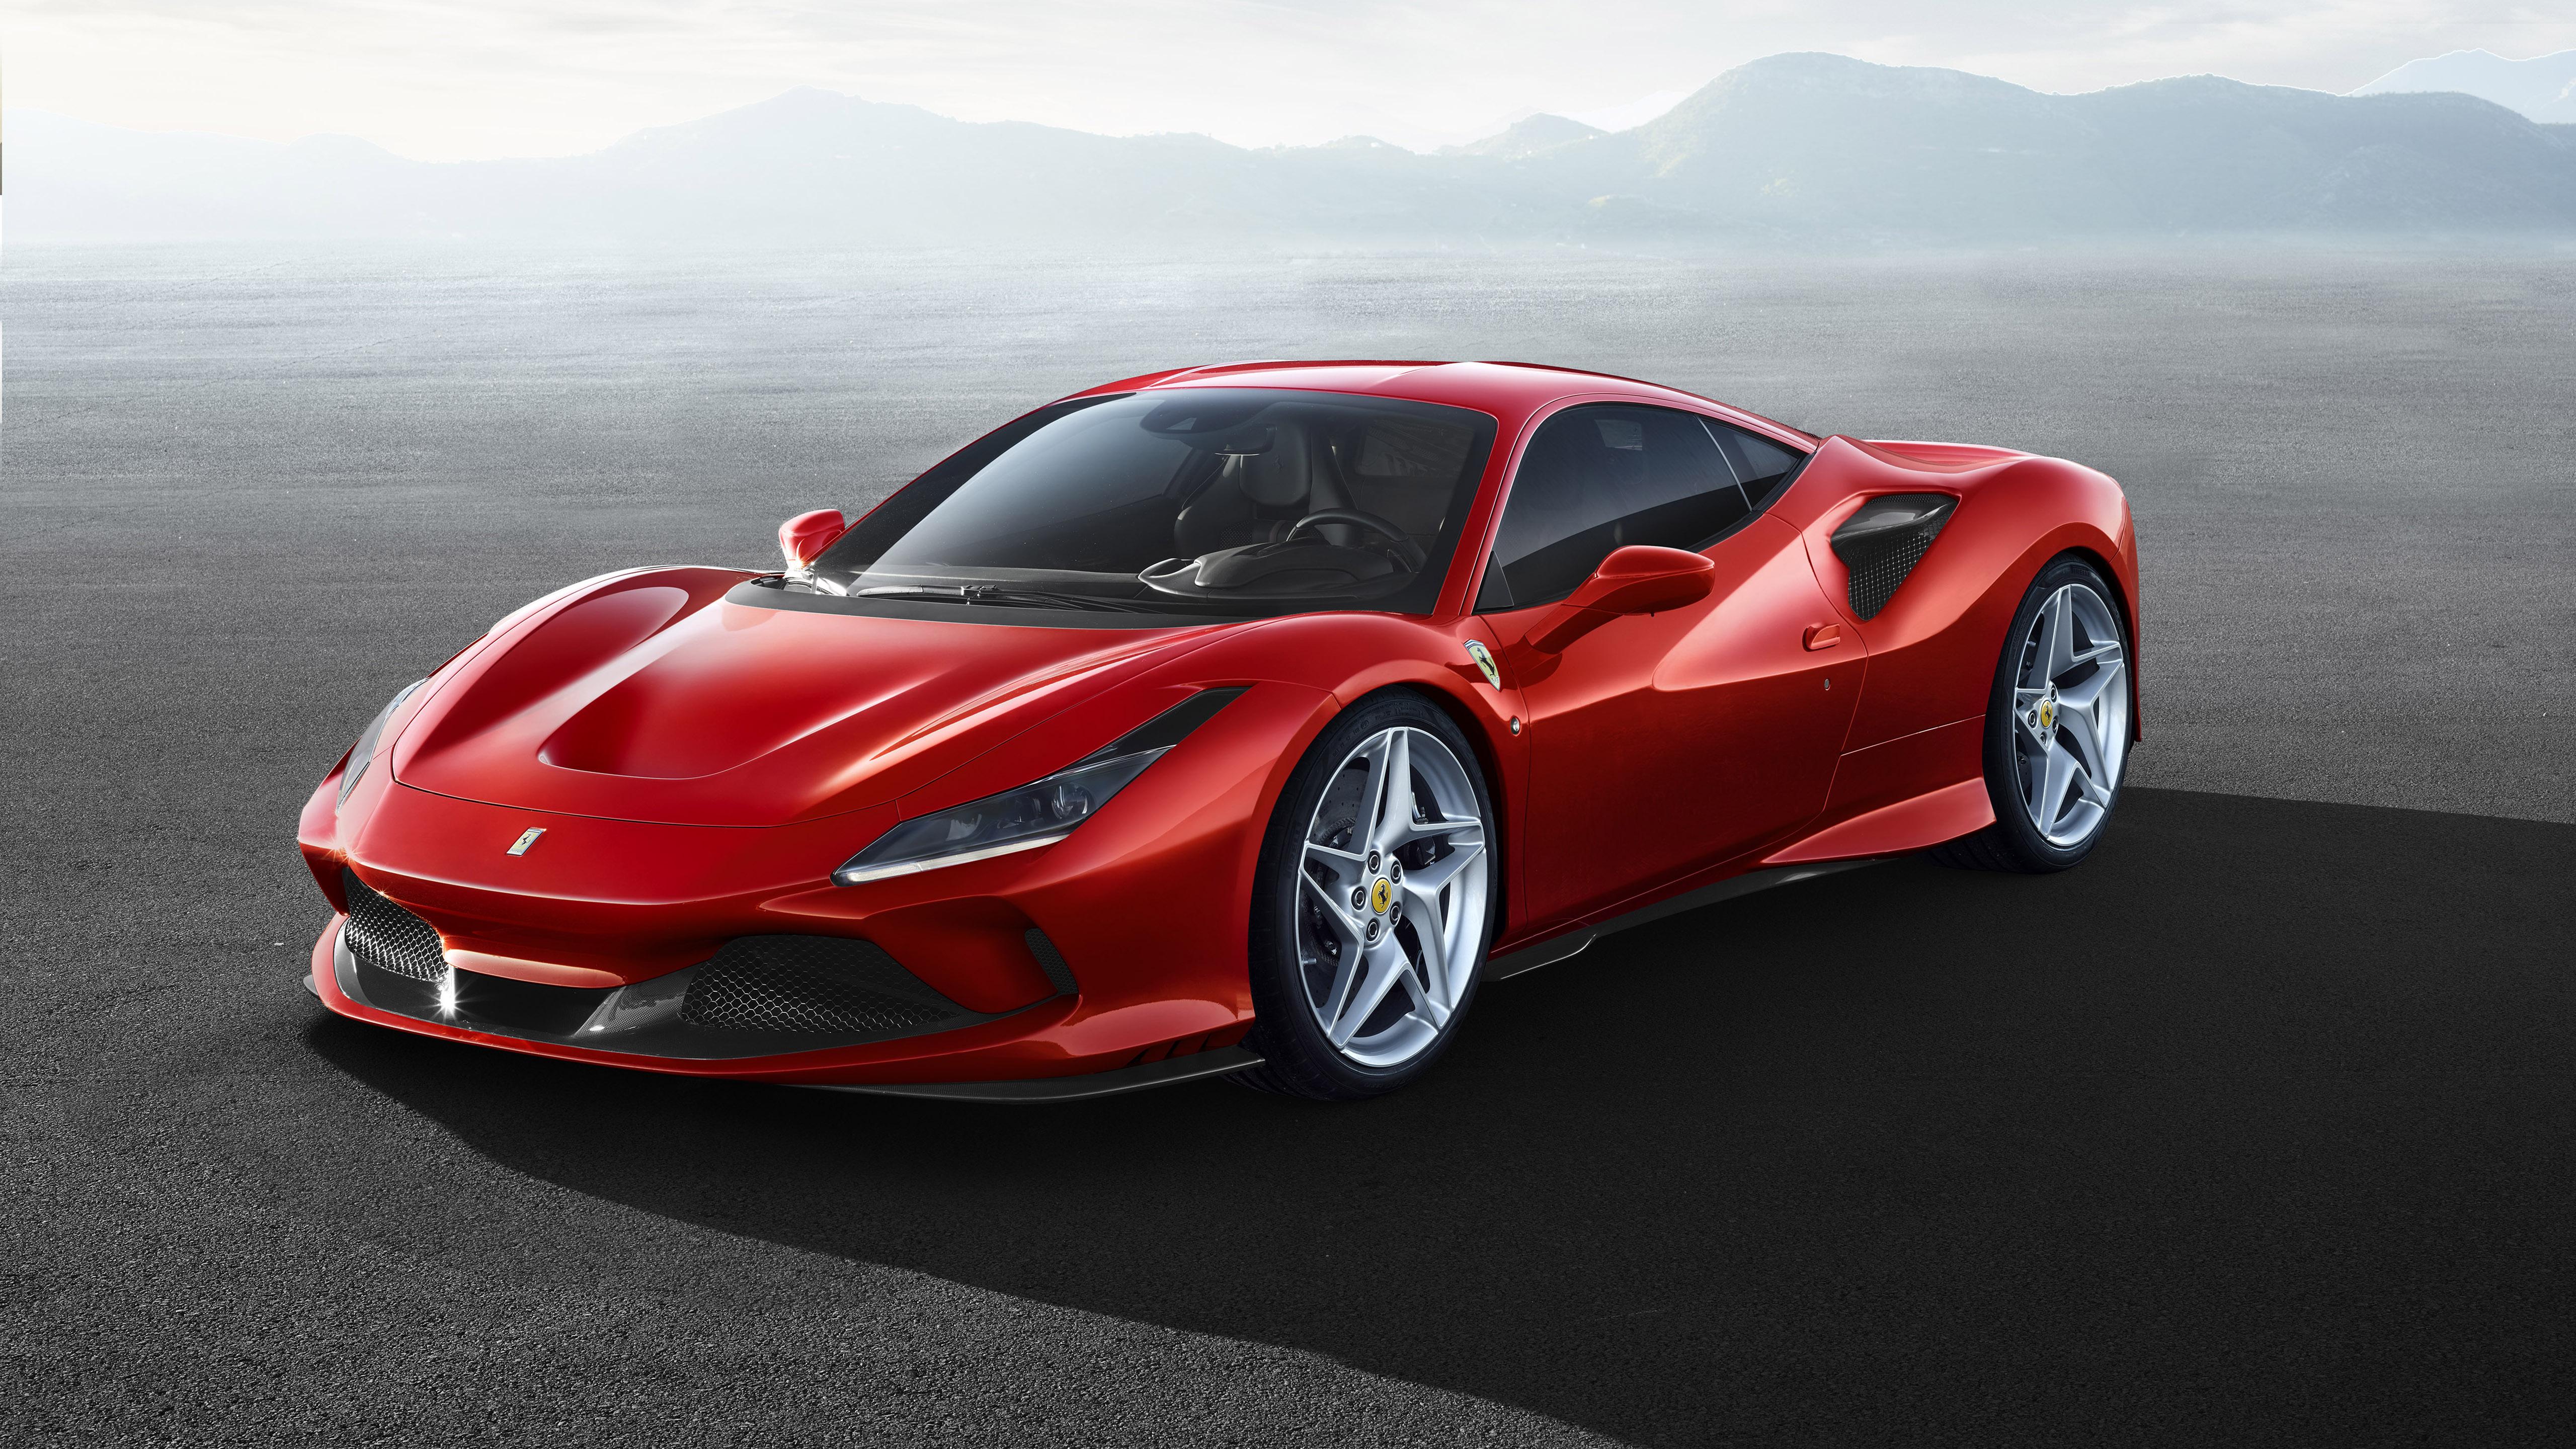 23+ Ferrari 2019 Wallpaper 4K  Images